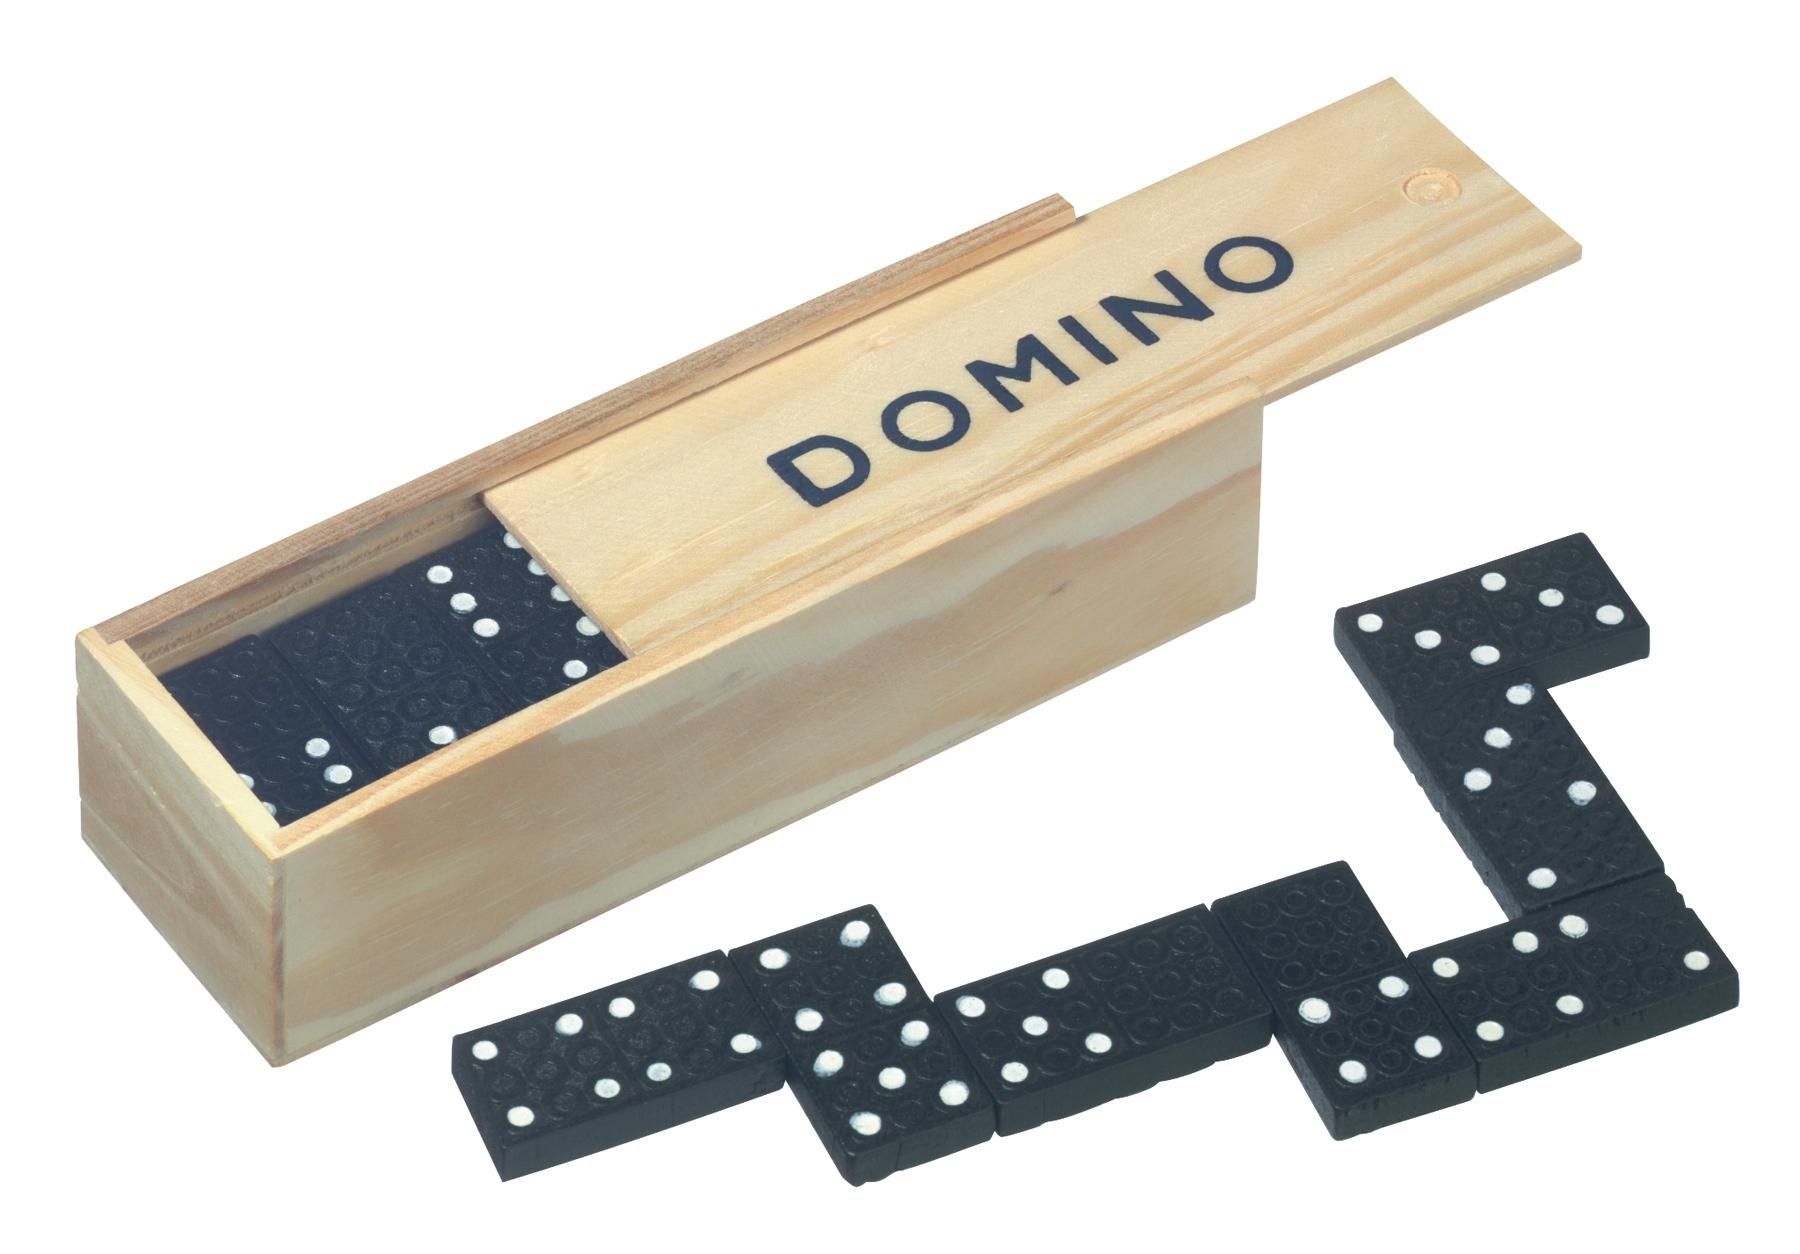 Gra DOMINO, czarny, drewniany